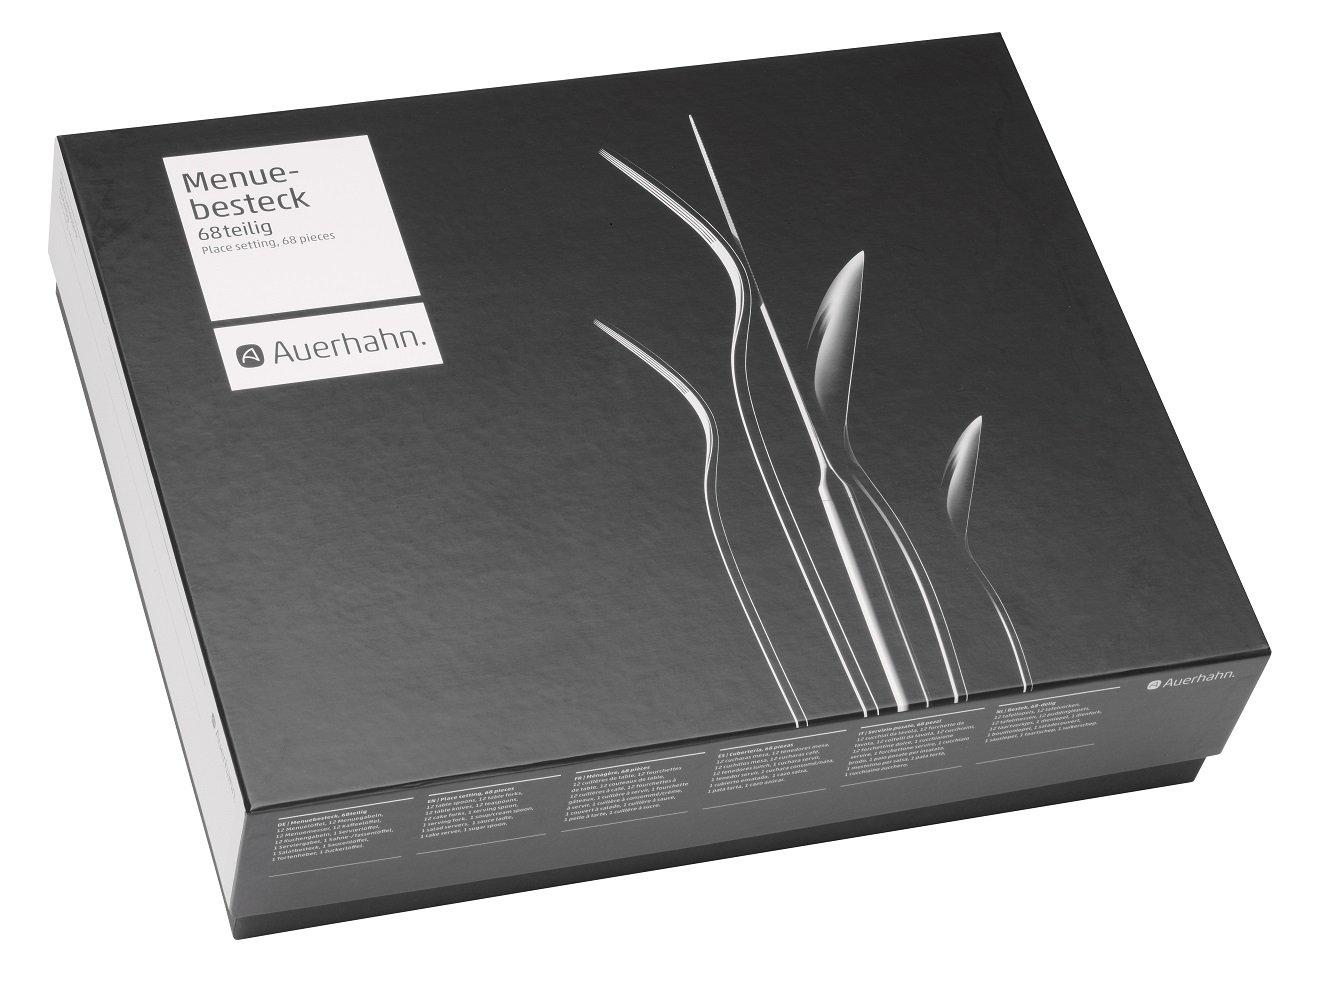 auerhahn 22 9302 0368 conturo matt 68 teilig besteckgarnitur k che haushalt. Black Bedroom Furniture Sets. Home Design Ideas